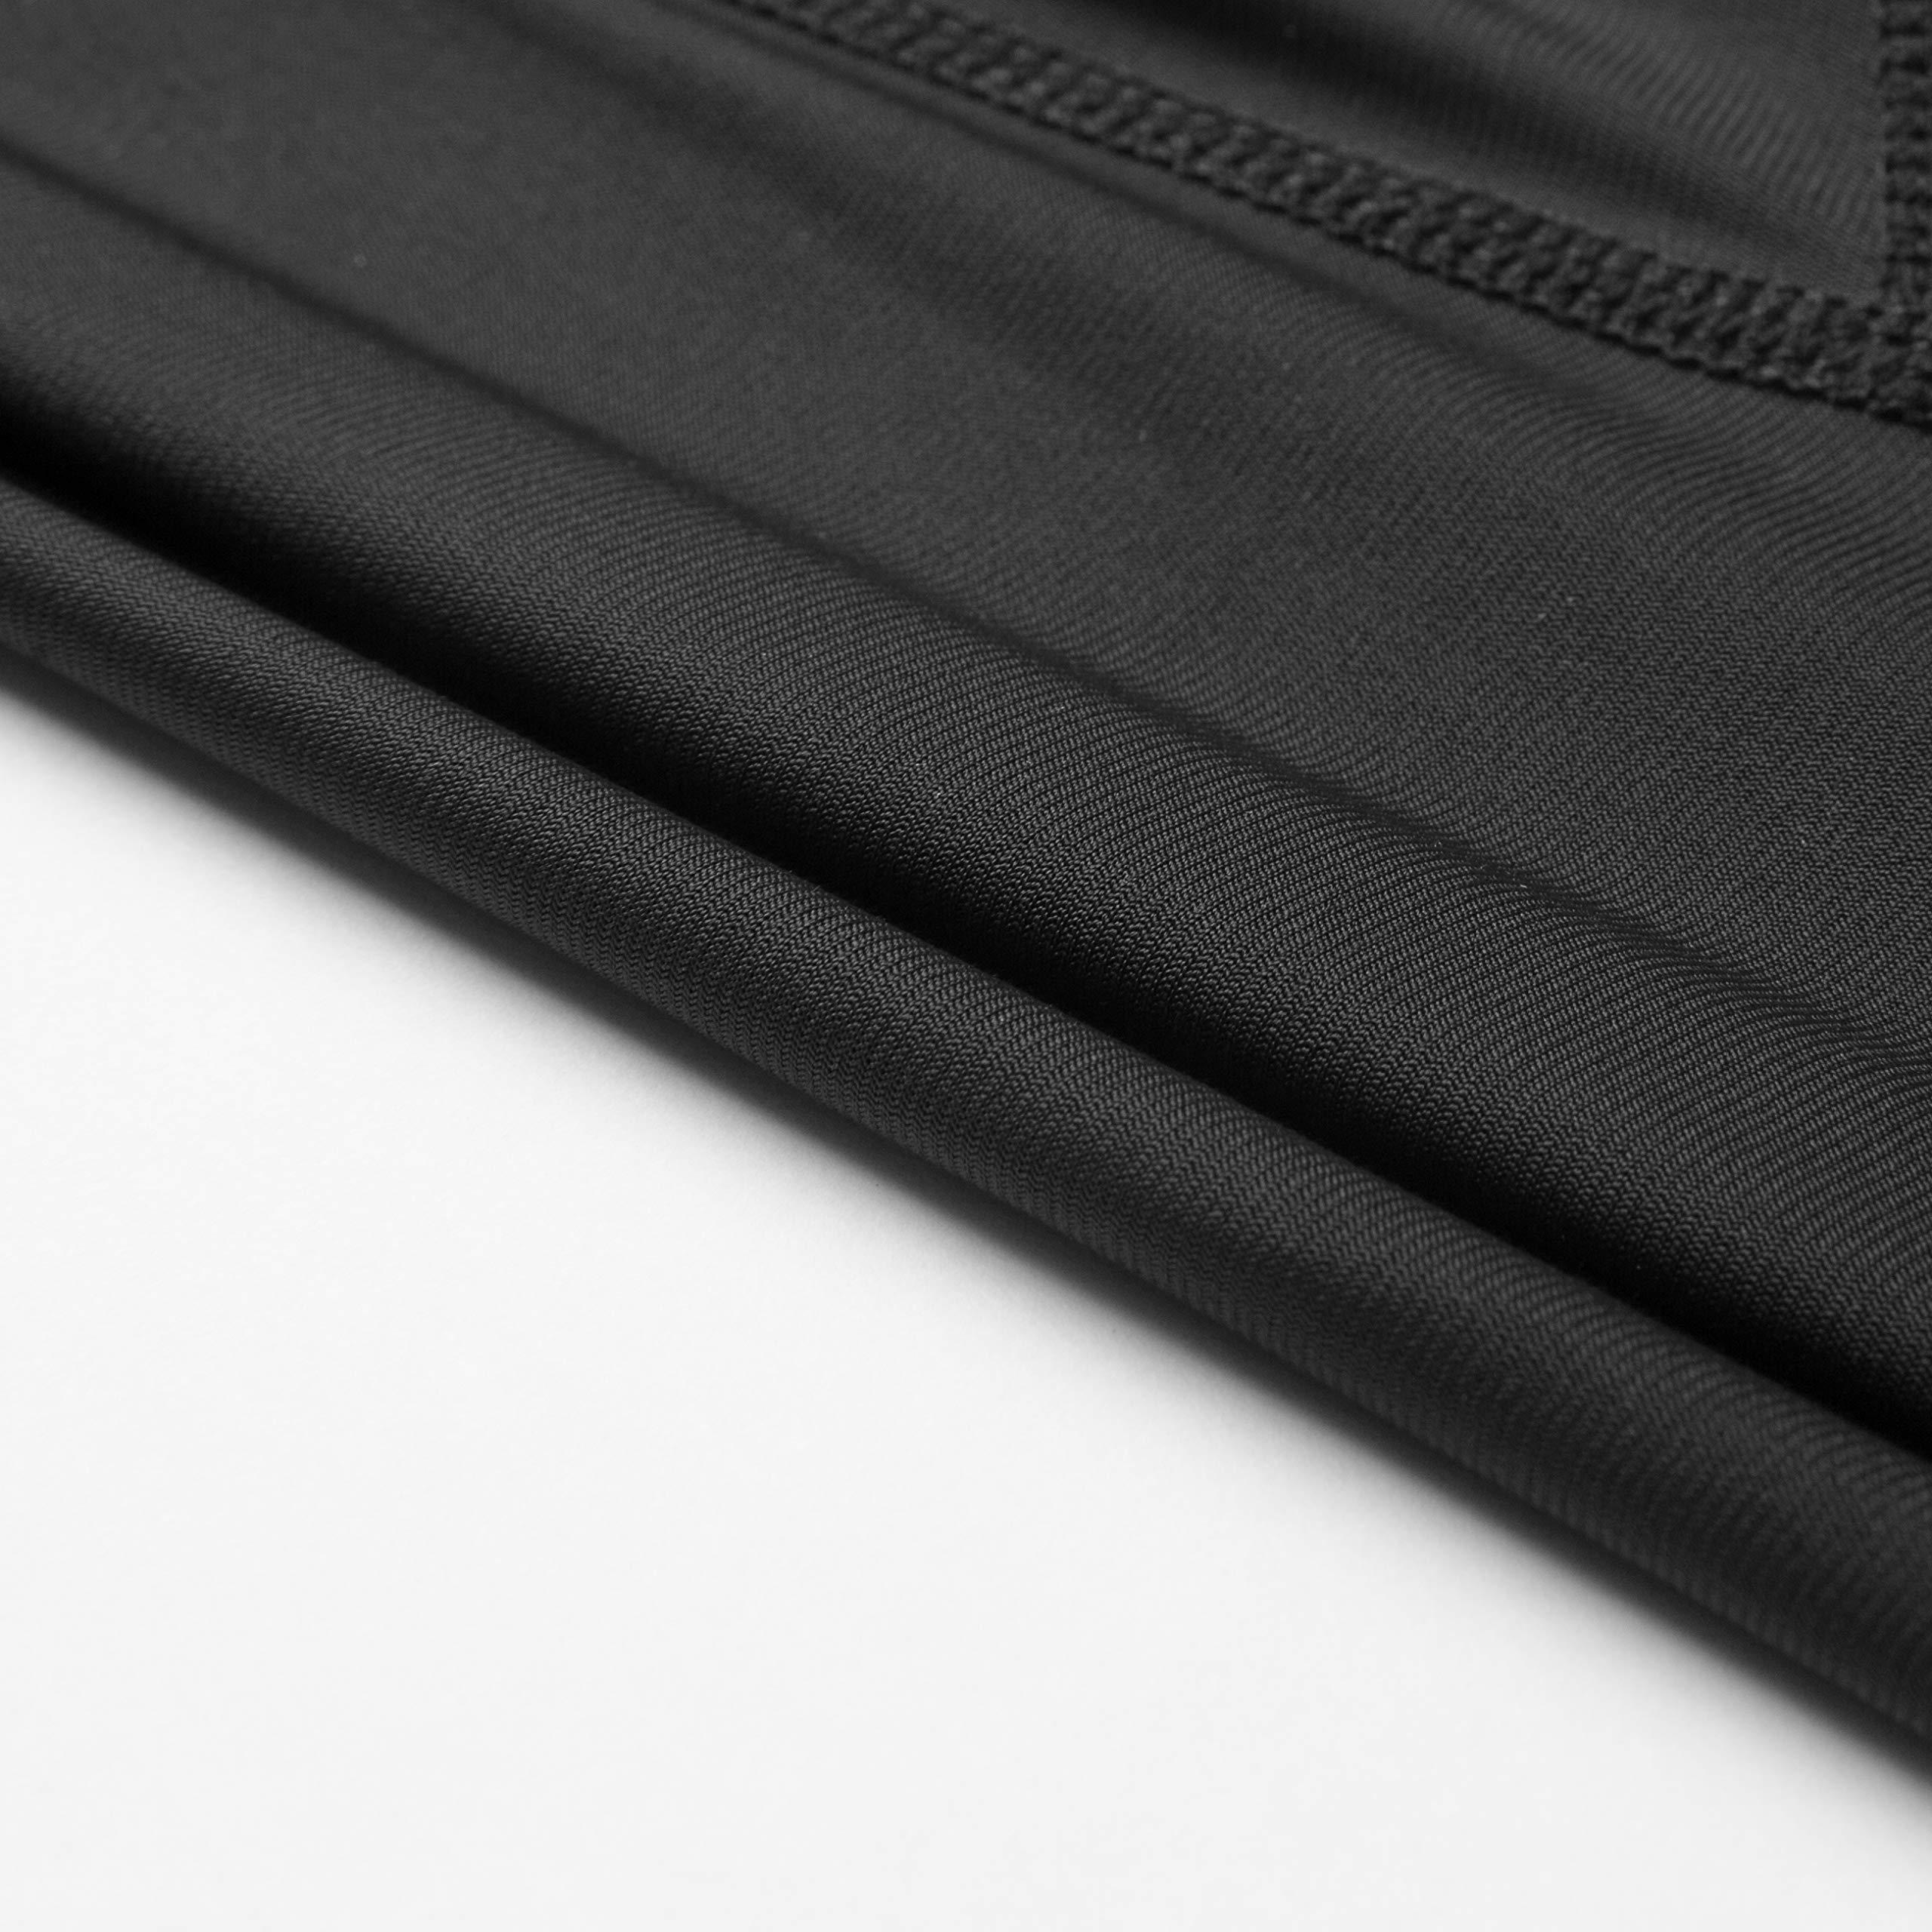 Przewalski Men's Cycling Bib Shorts, 4D Padded Compression Bike Tights Breathable Bicycle Pants UPF 50+, Classic Series, Black/XL by Przewalski (Image #9)